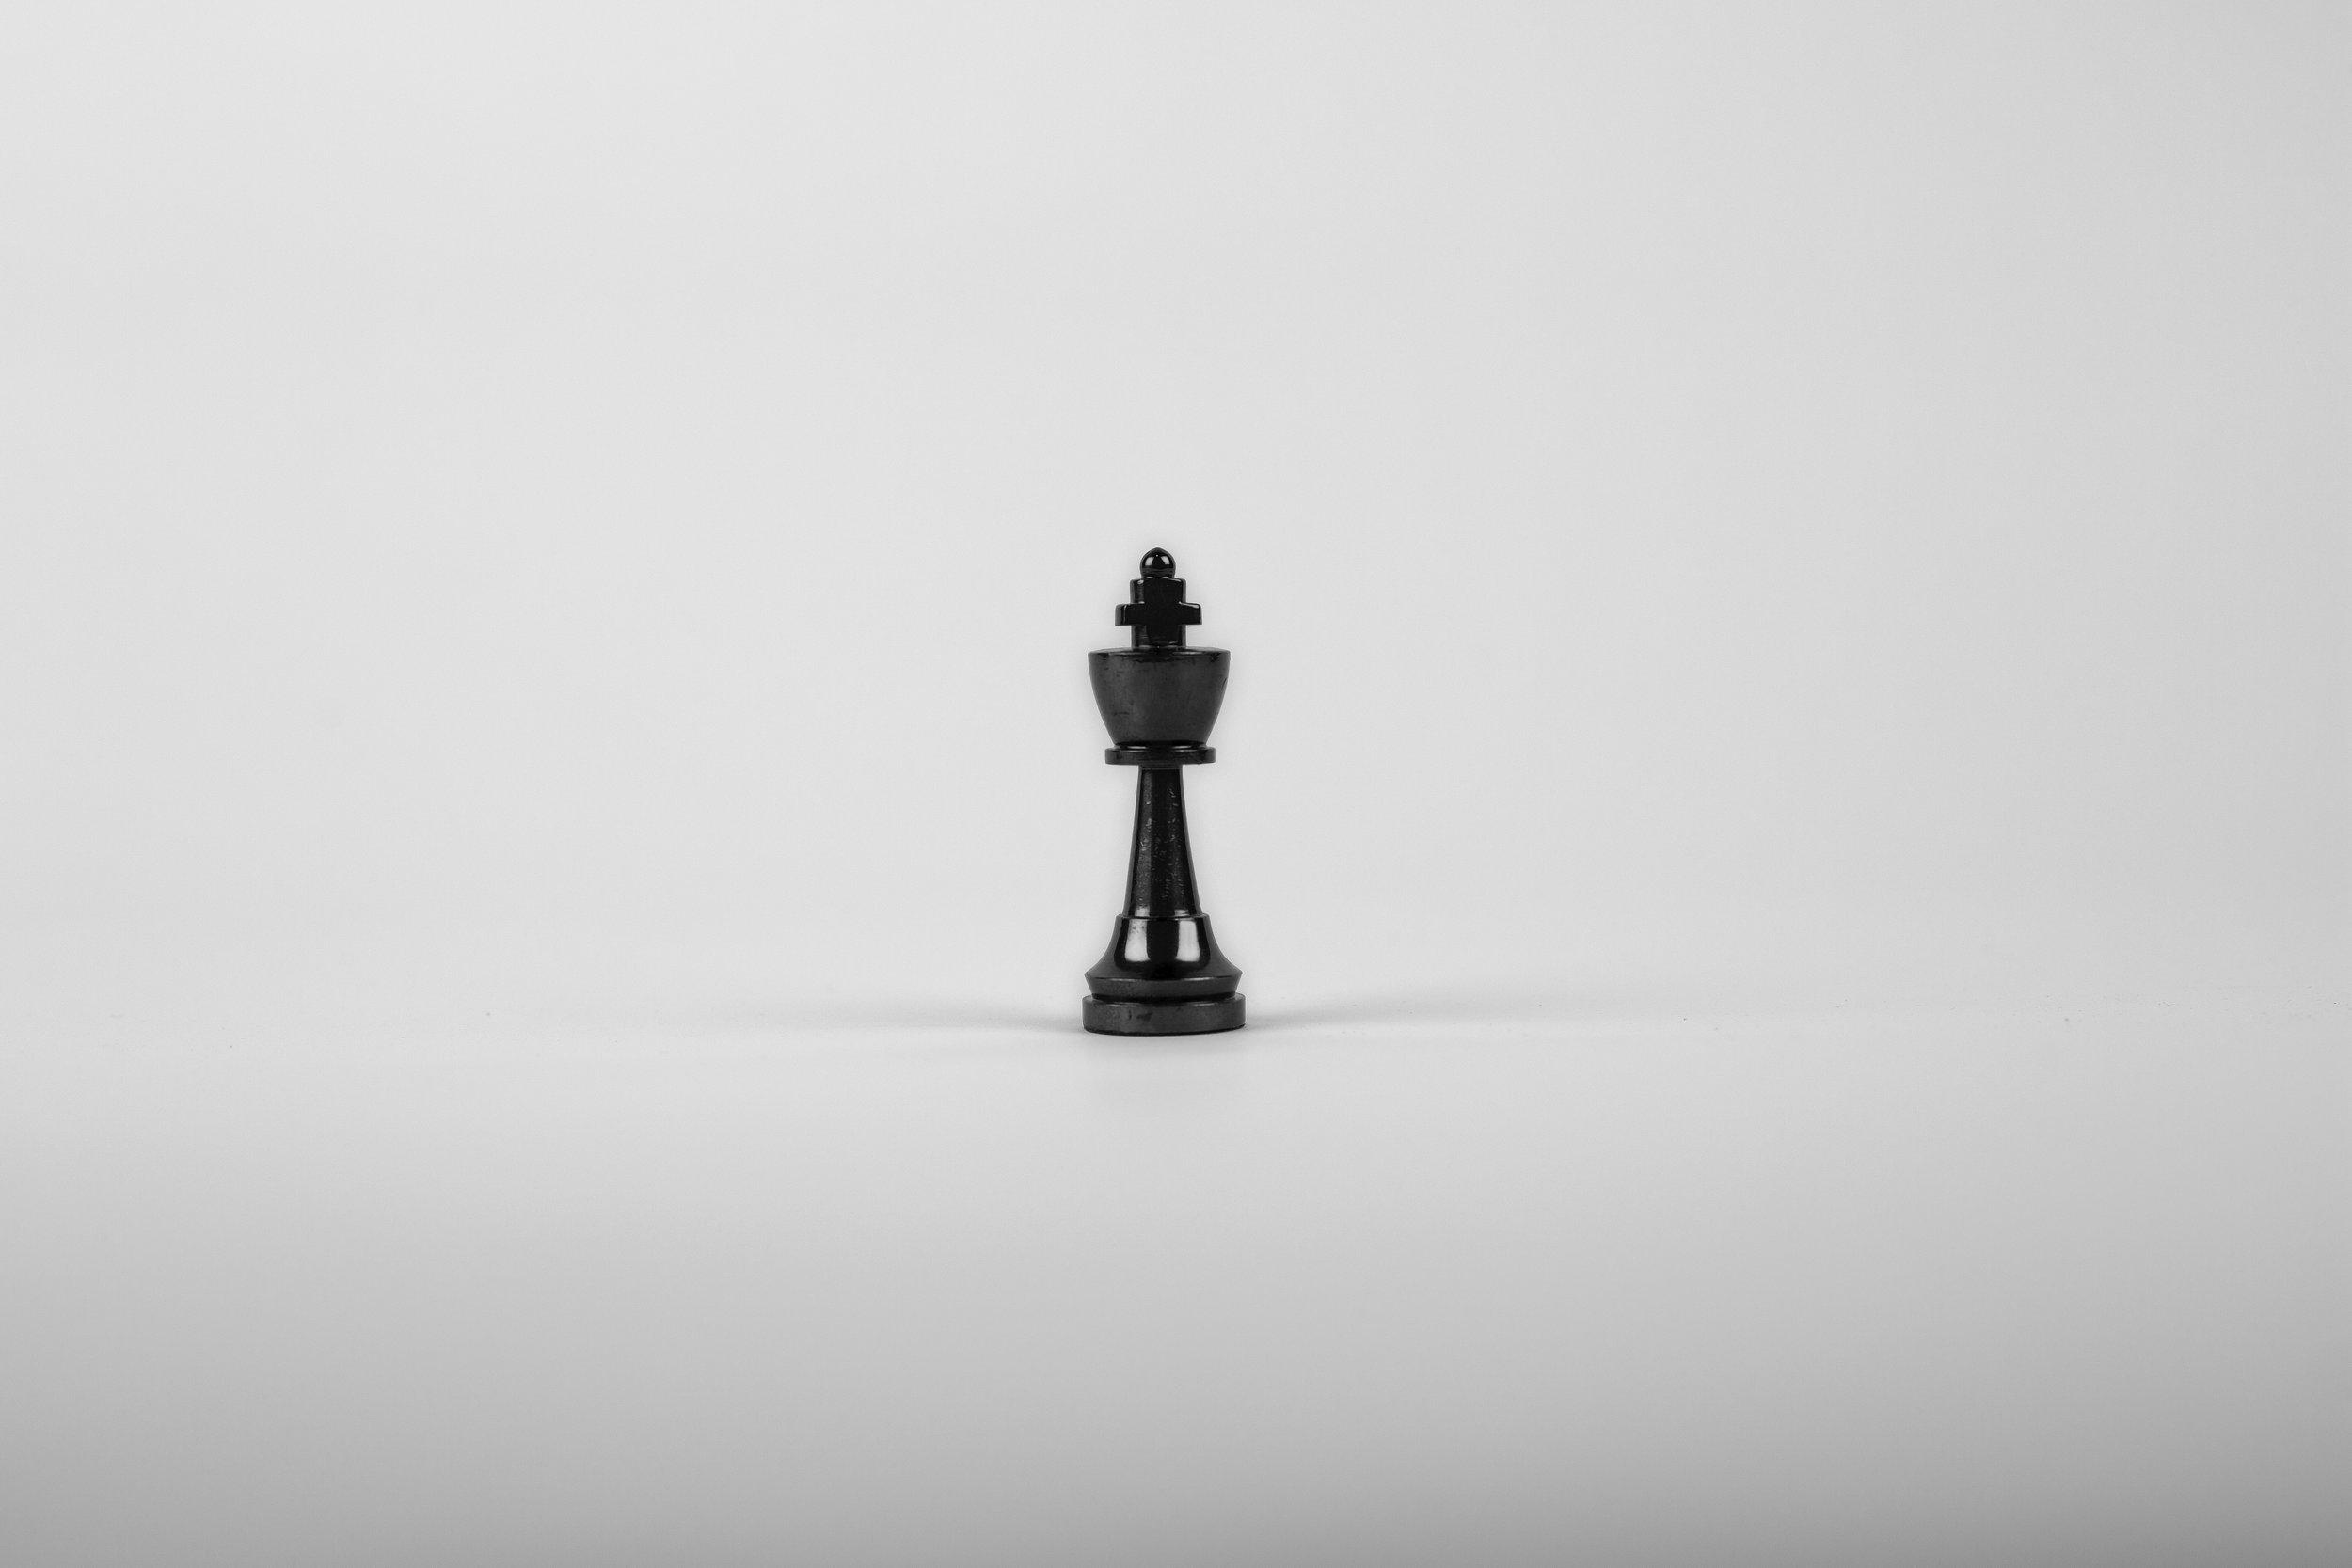 black-and-white-chess-chess-piece-411195.jpg